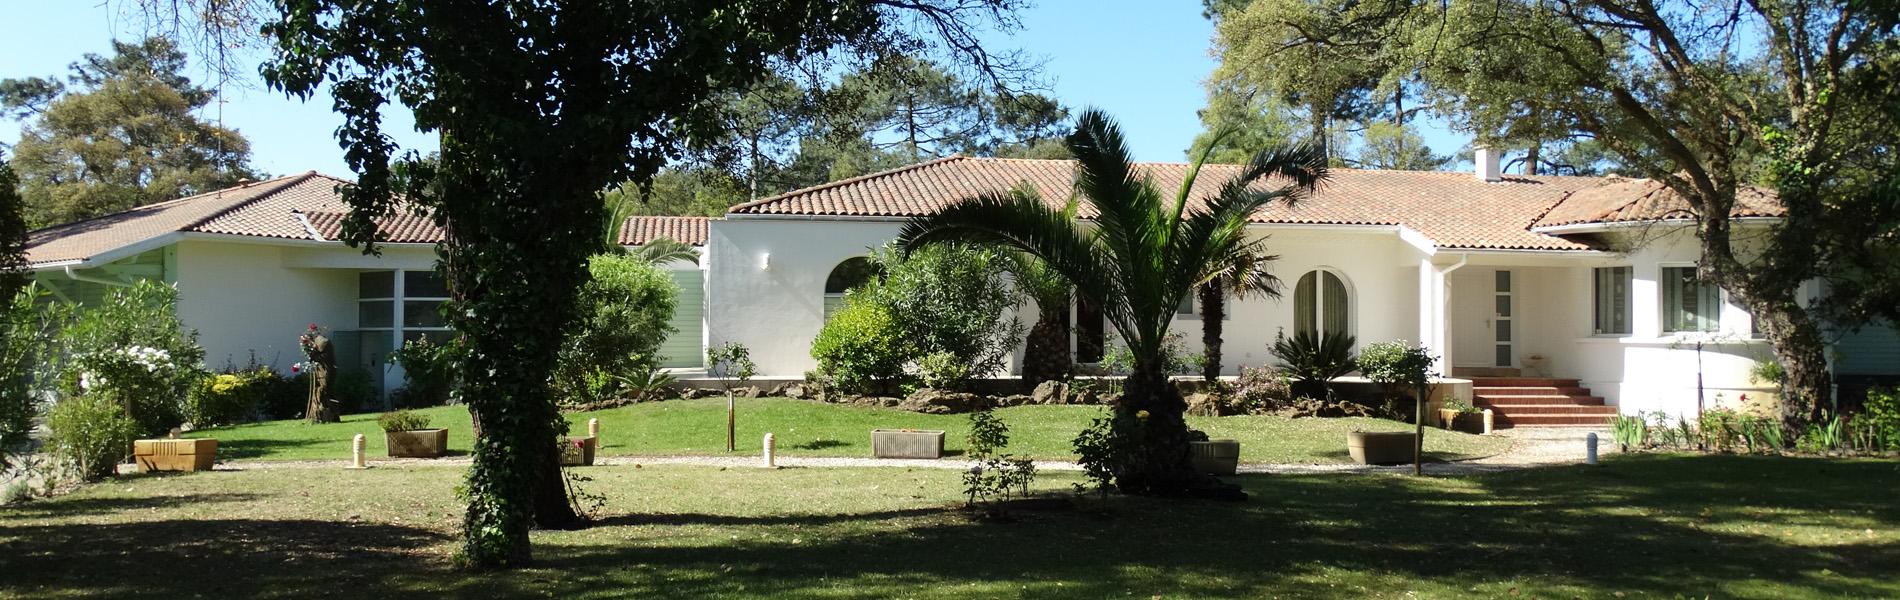 Terres oc an agence immobili re hossegor et biarritz for Achat maison de prestige